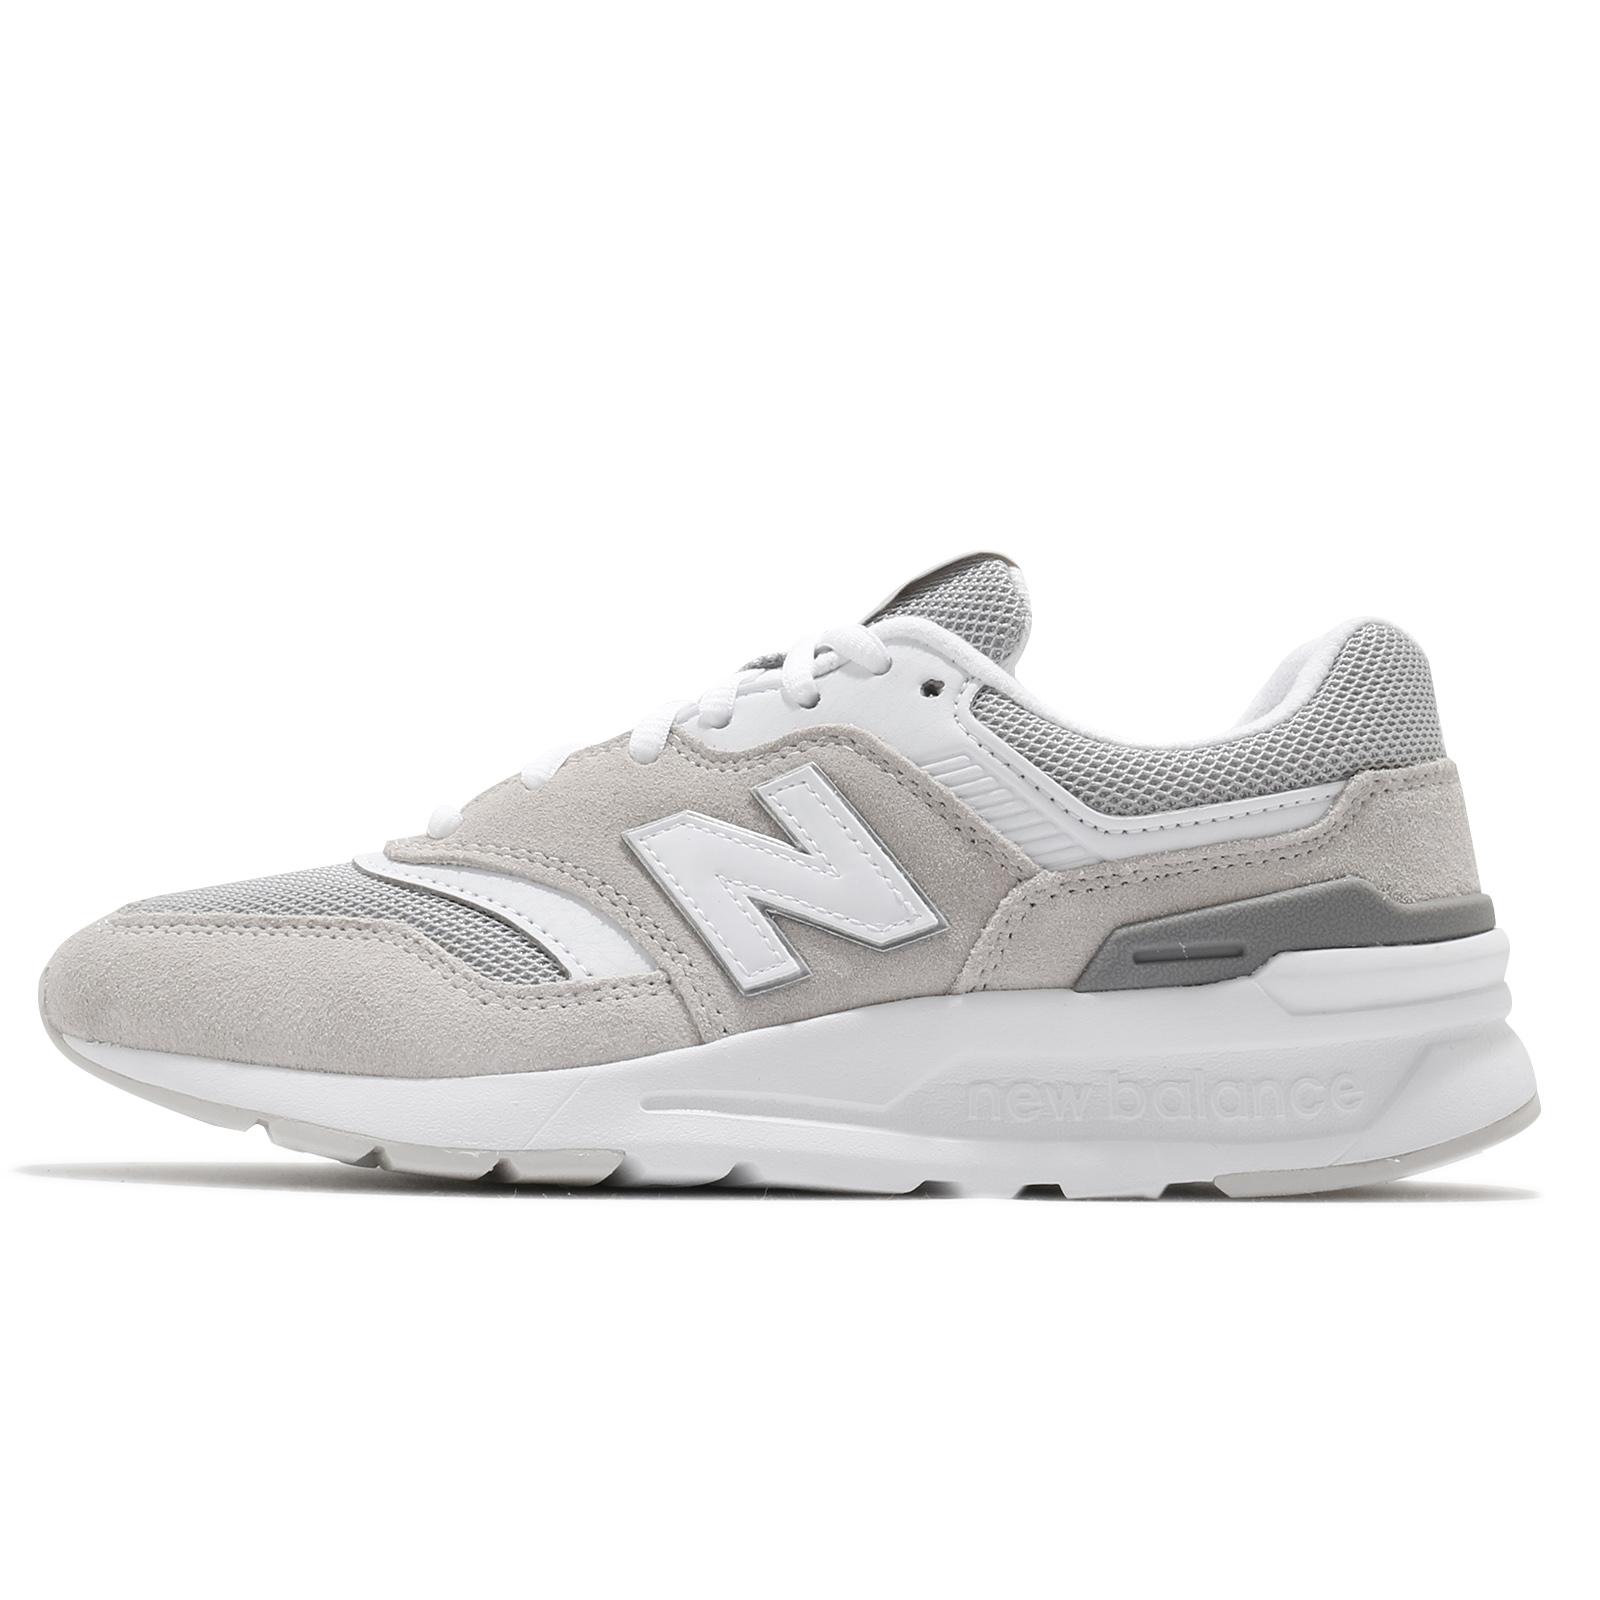 New Balance 休閒鞋 997H 女鞋 灰 白 麂皮 997 經典 穿搭 運動鞋 【ACS】 CW997HCRB